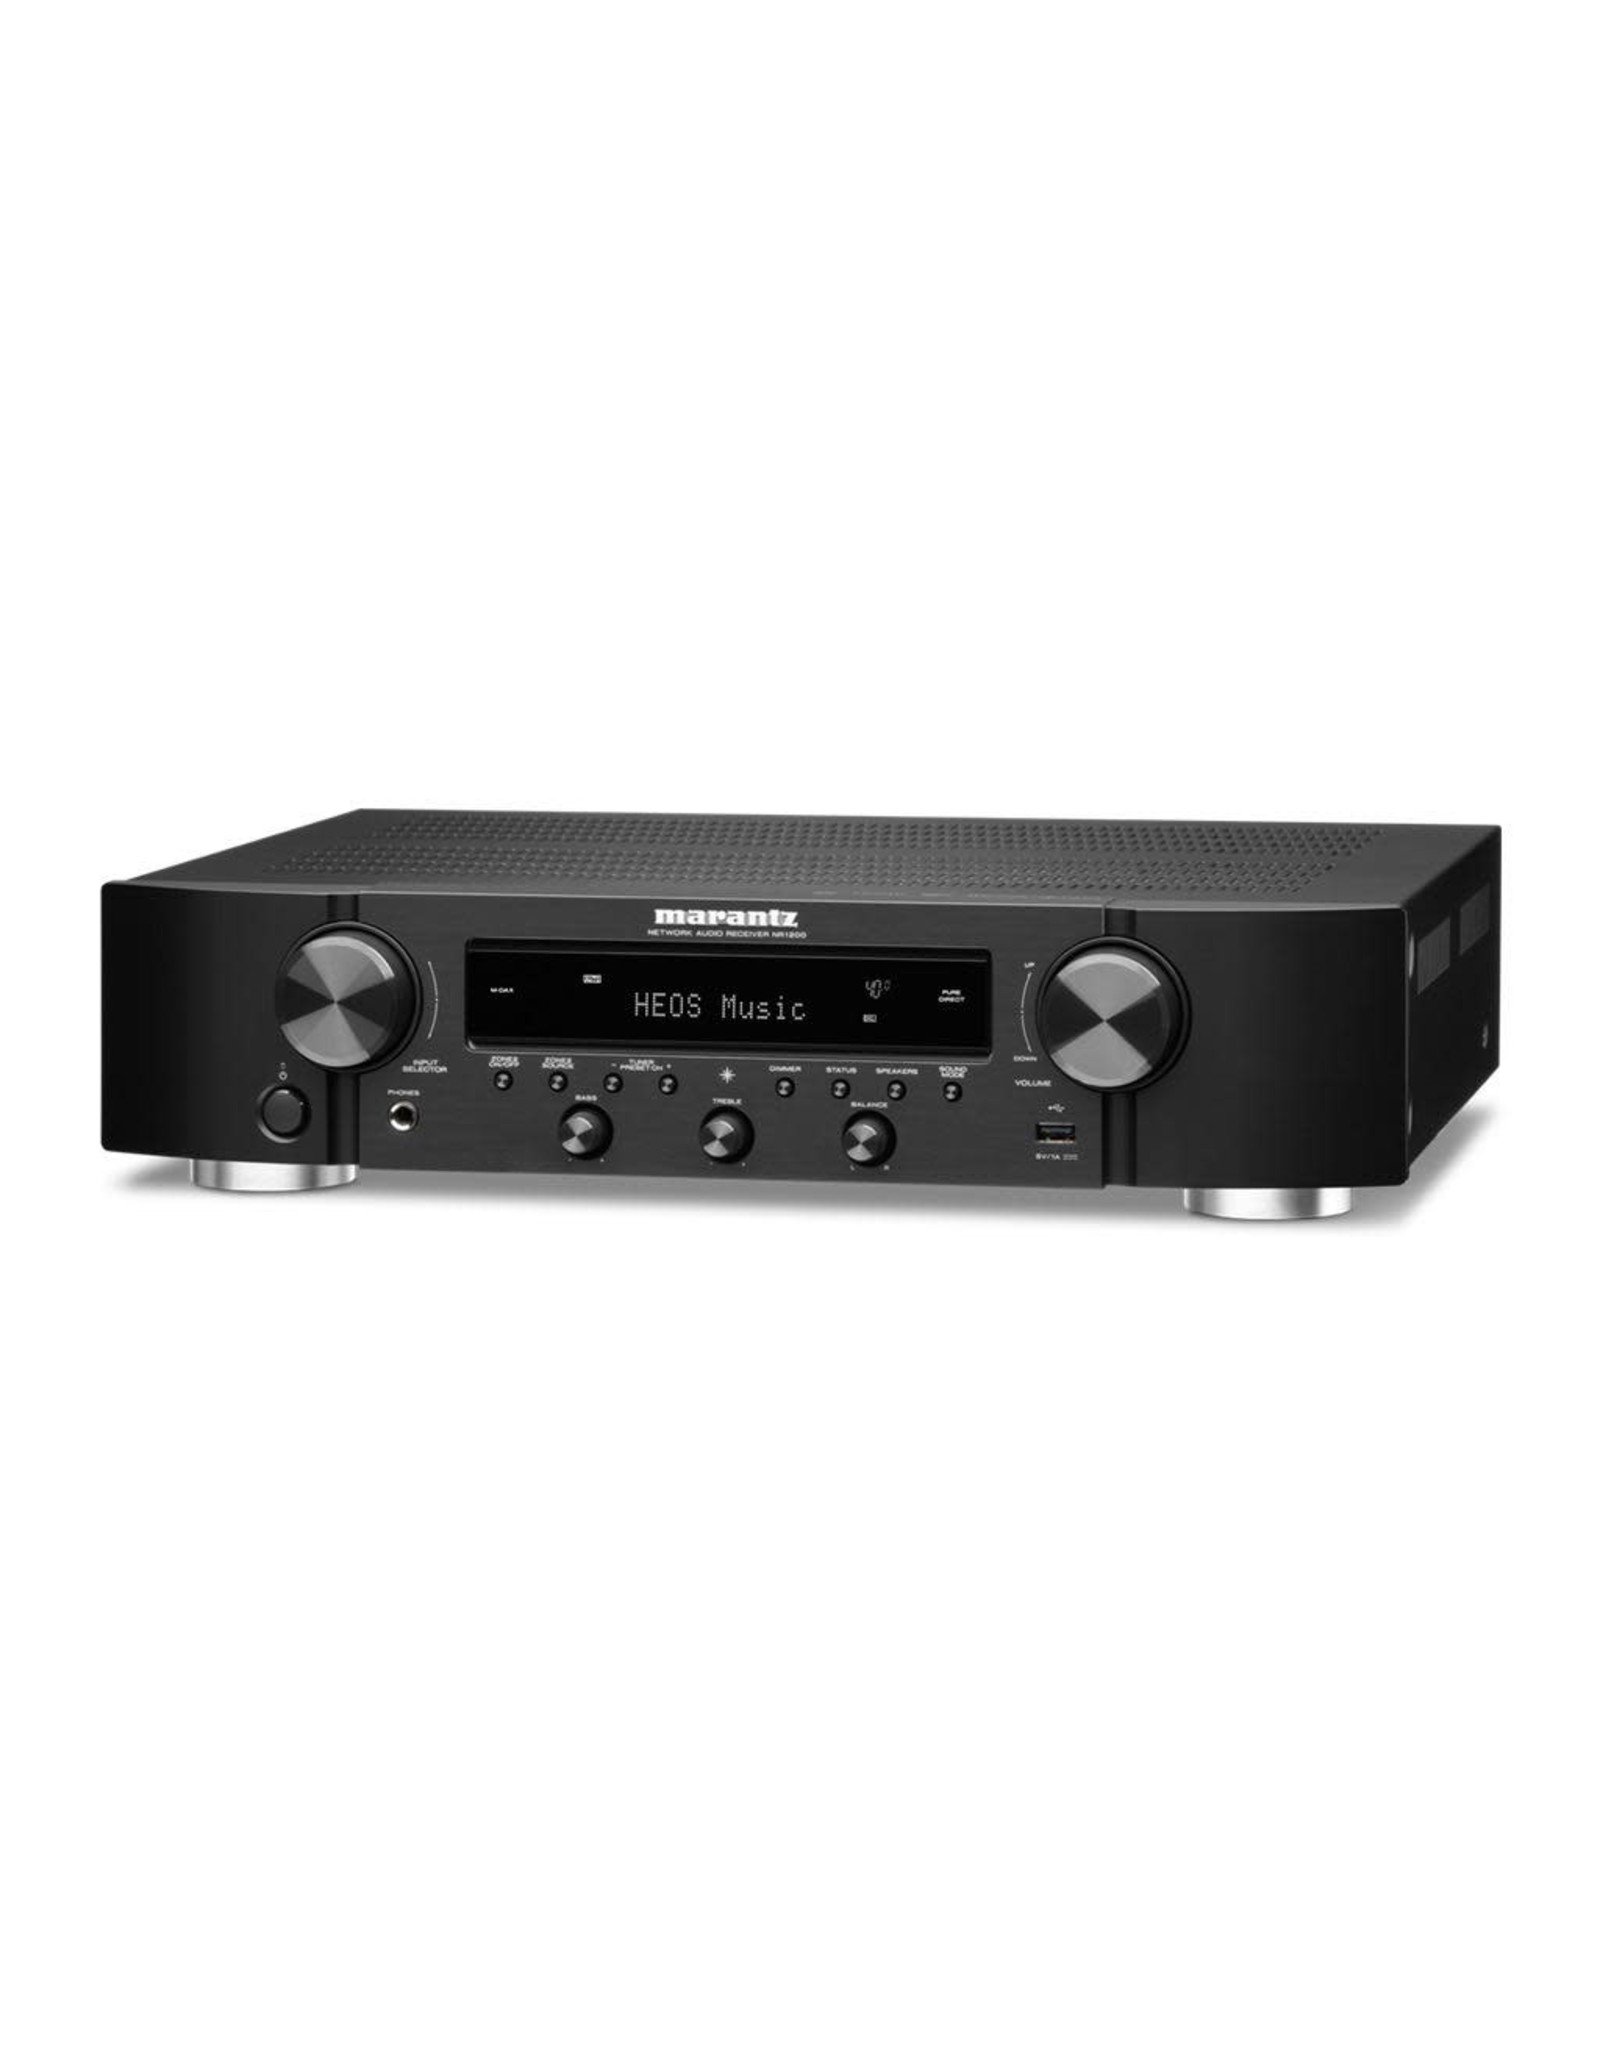 MARANTZ MARANTZ NR1200 Stereo Receiver w/Heos BLACK